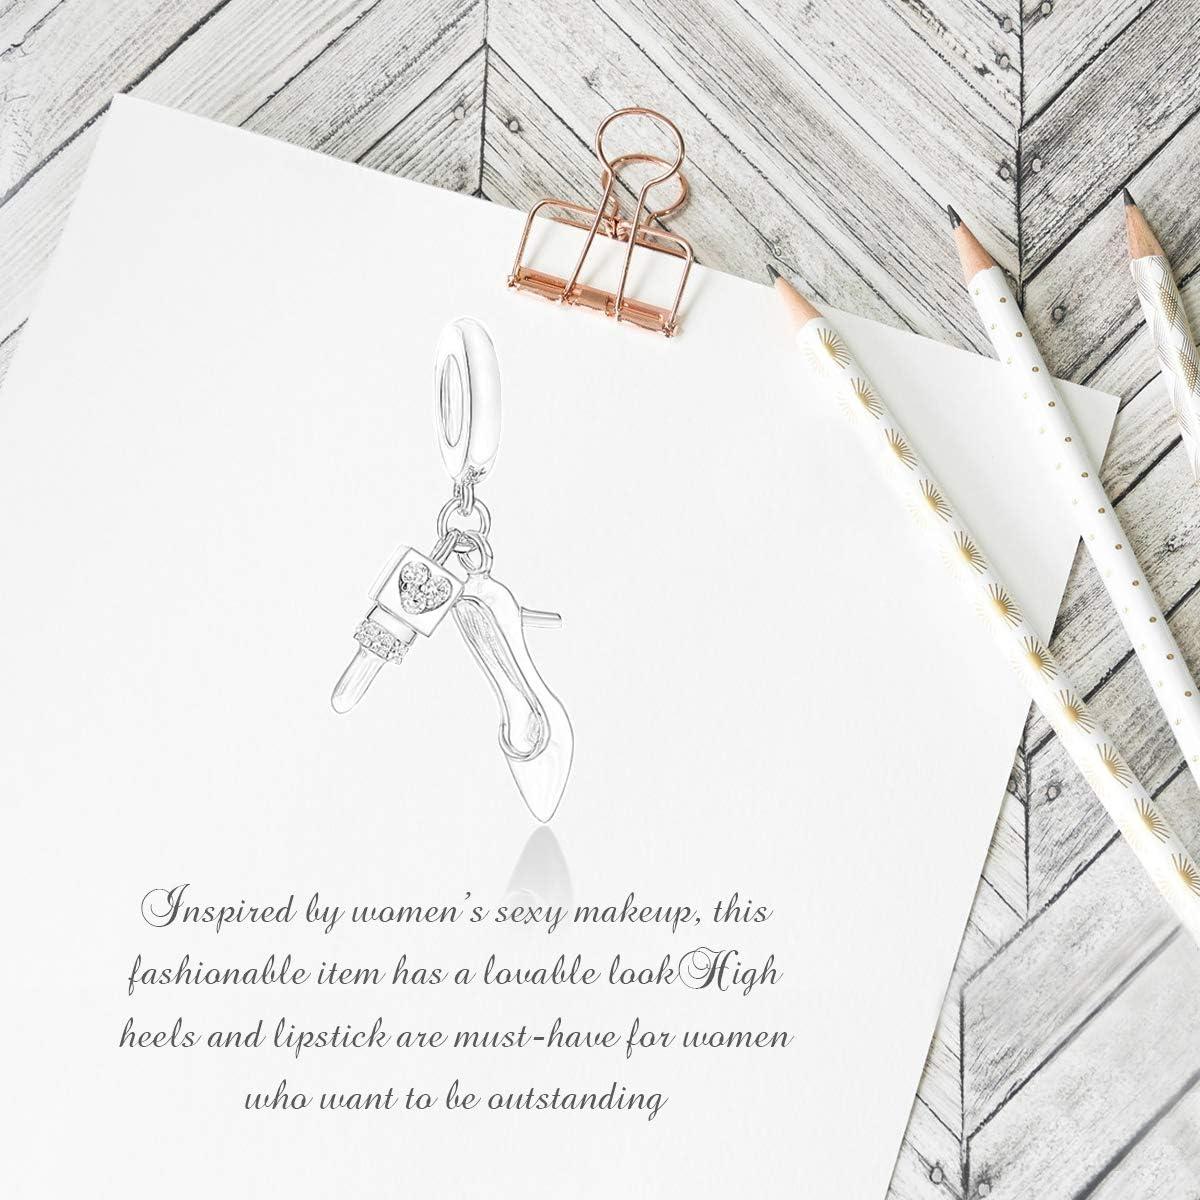 Forever Queen Abalorio de tal/ón alto y barra de labios para pulsera de plata de ley 925 con caja de regalo